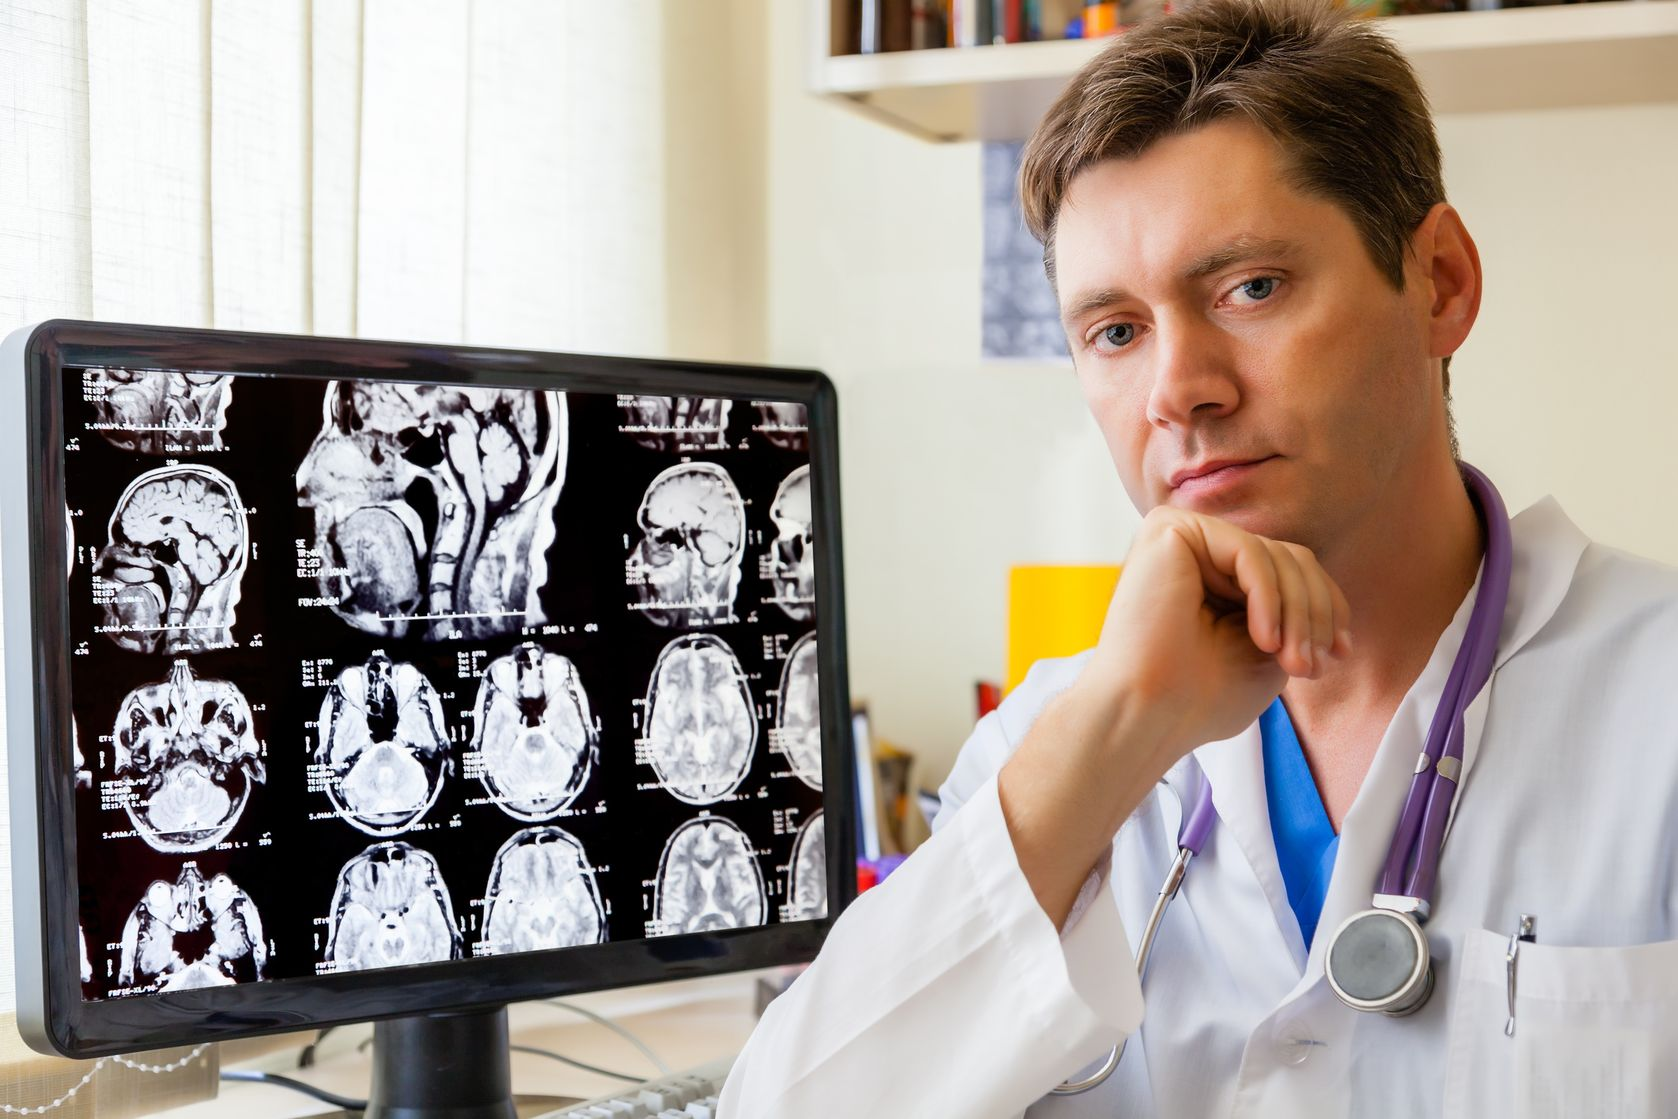 Commonwealth Radiology